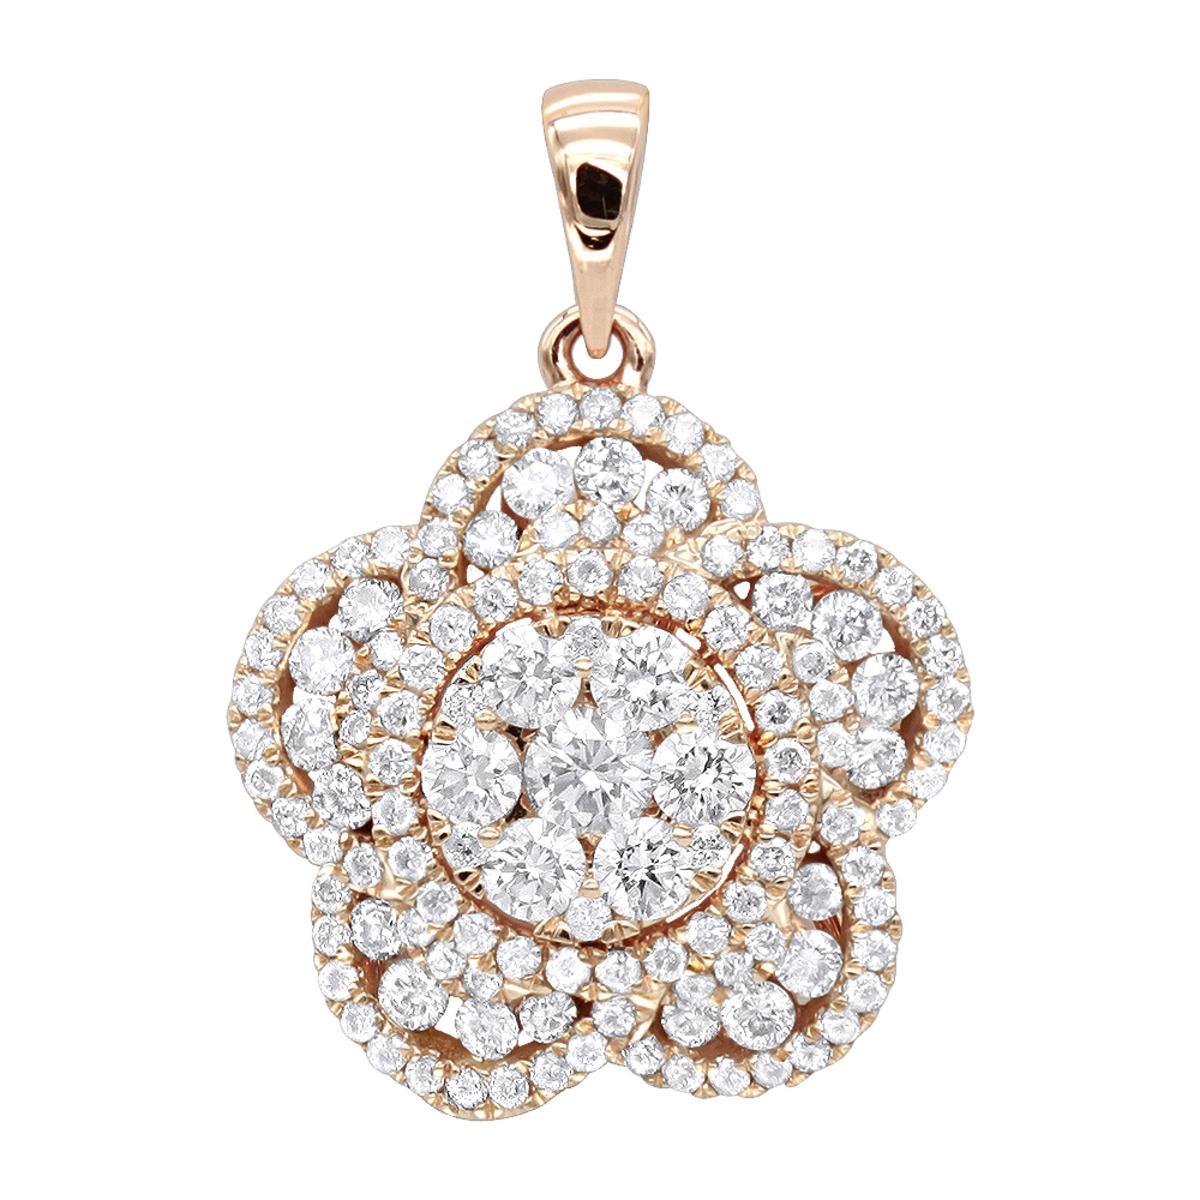 14K Gold Designer Ladies Diamond Flower Pendant 1.25ct by Luxurman